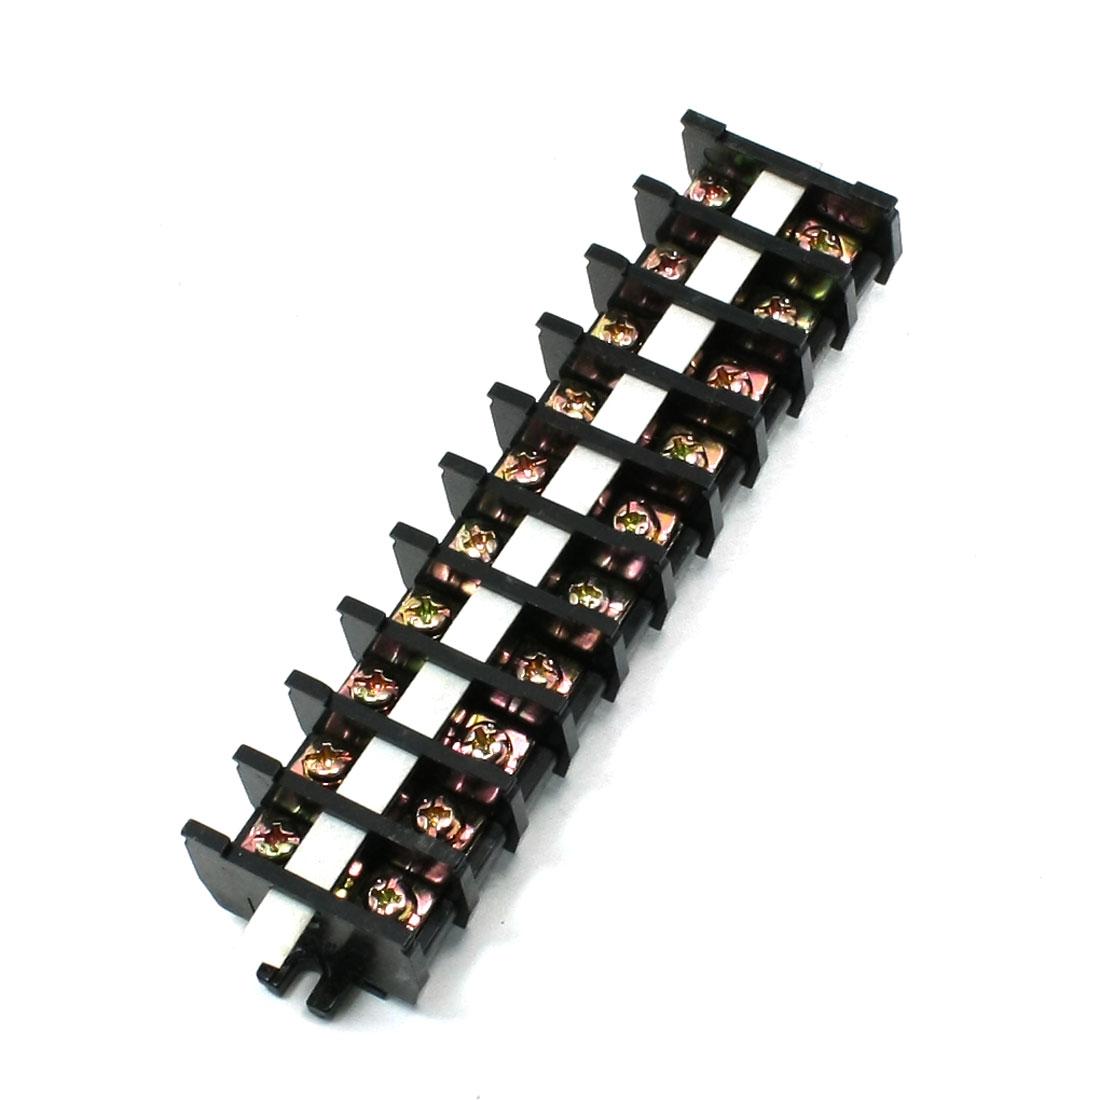 30A 600V Double Rows 10 Position Connector Strips Terminal Blocks